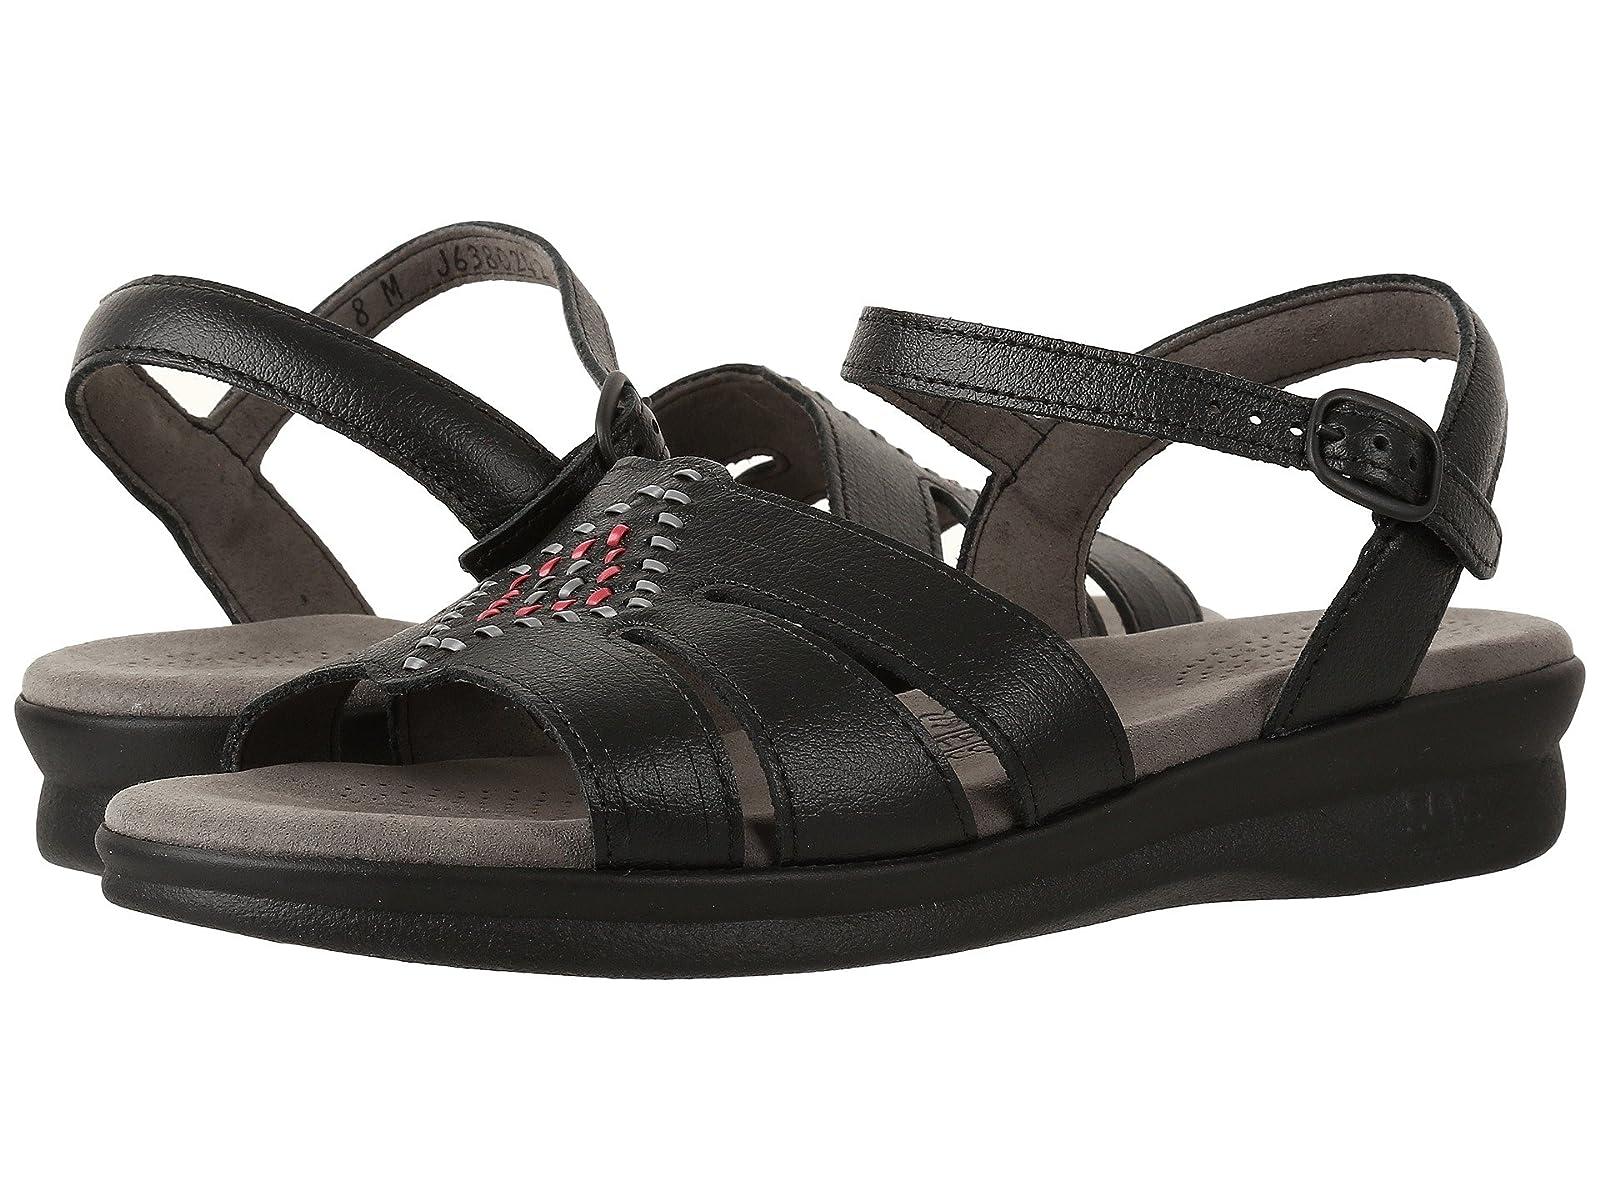 SAS HuaracheAtmospheric grades have affordable shoes